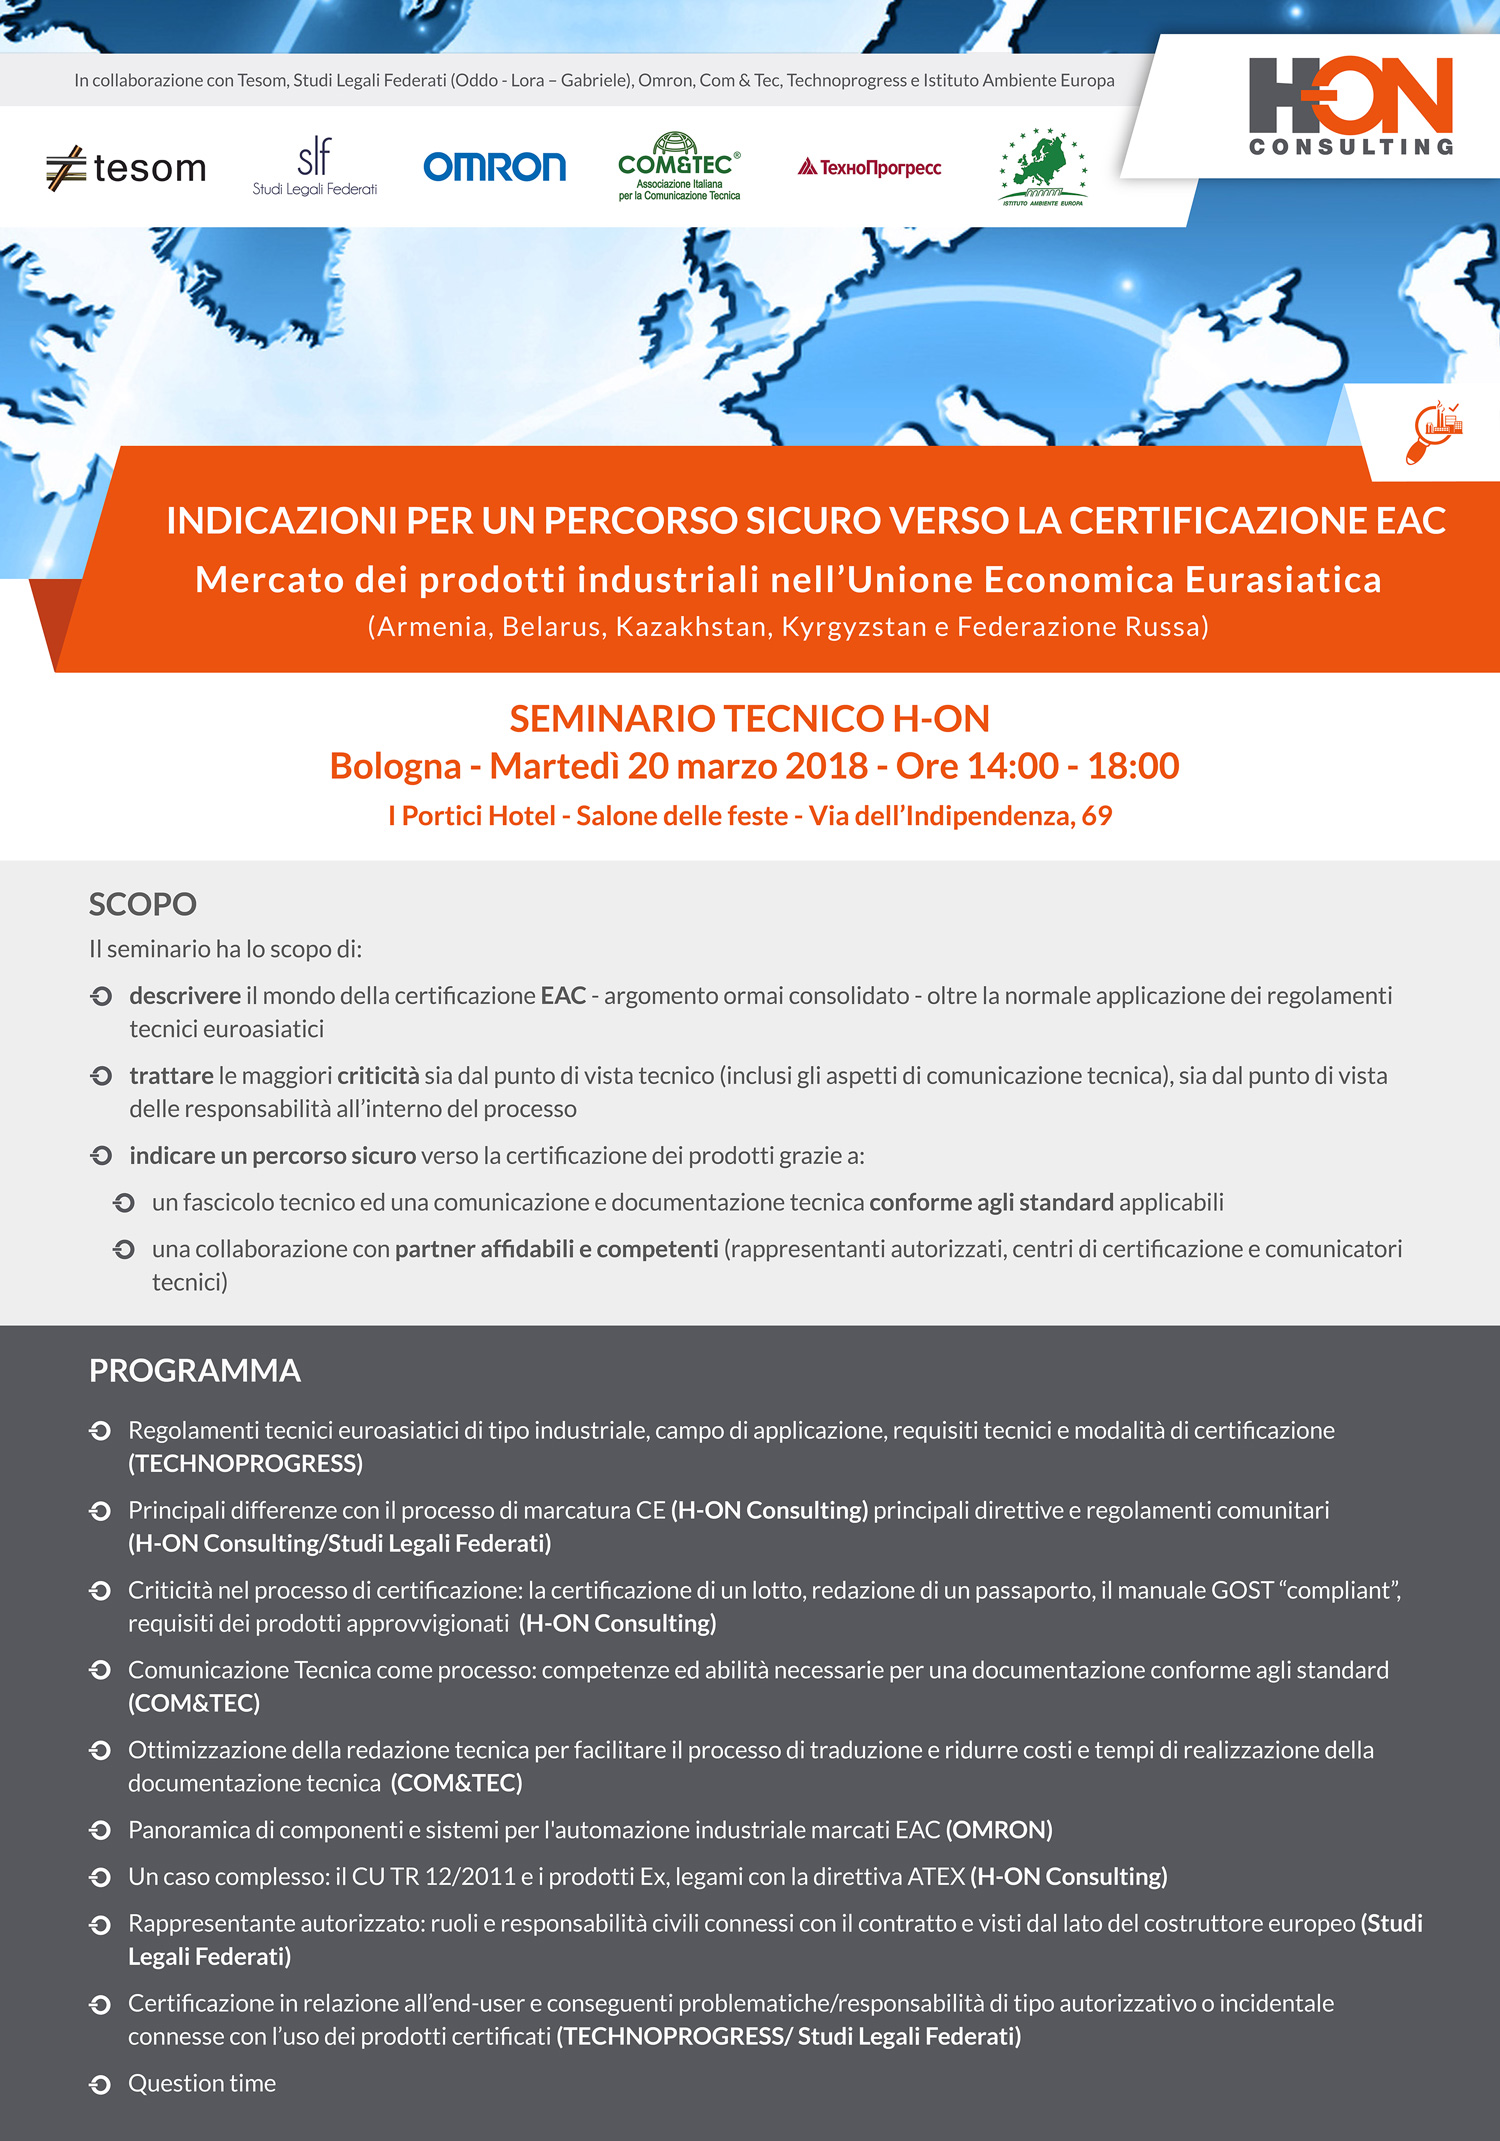 Seminario Tecnico H-ON Bologna - Martedì 20 Marzo 2018